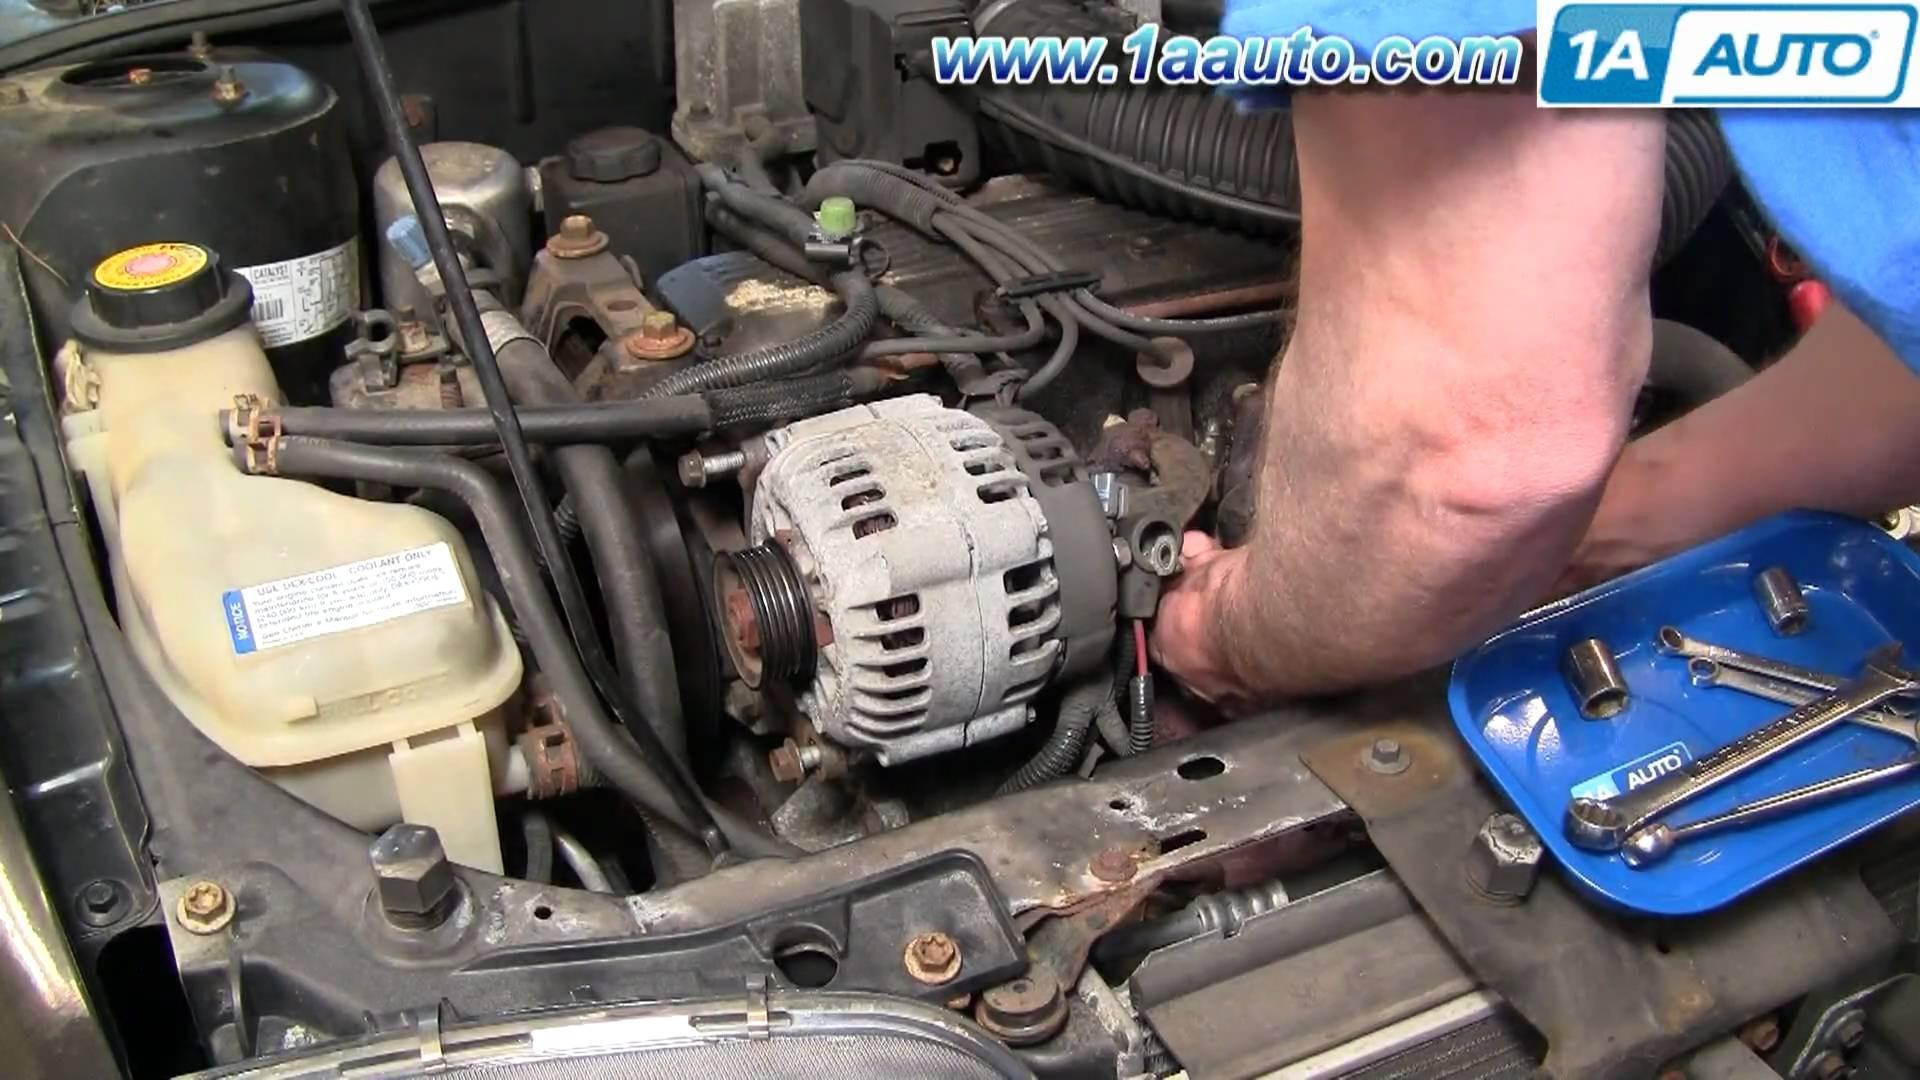 Pontiac Sunfire Engine Diagram How to Install Replace Alternator Cavalier Sunfire 2 2l 95 05 1aauto Of Pontiac Sunfire Engine Diagram